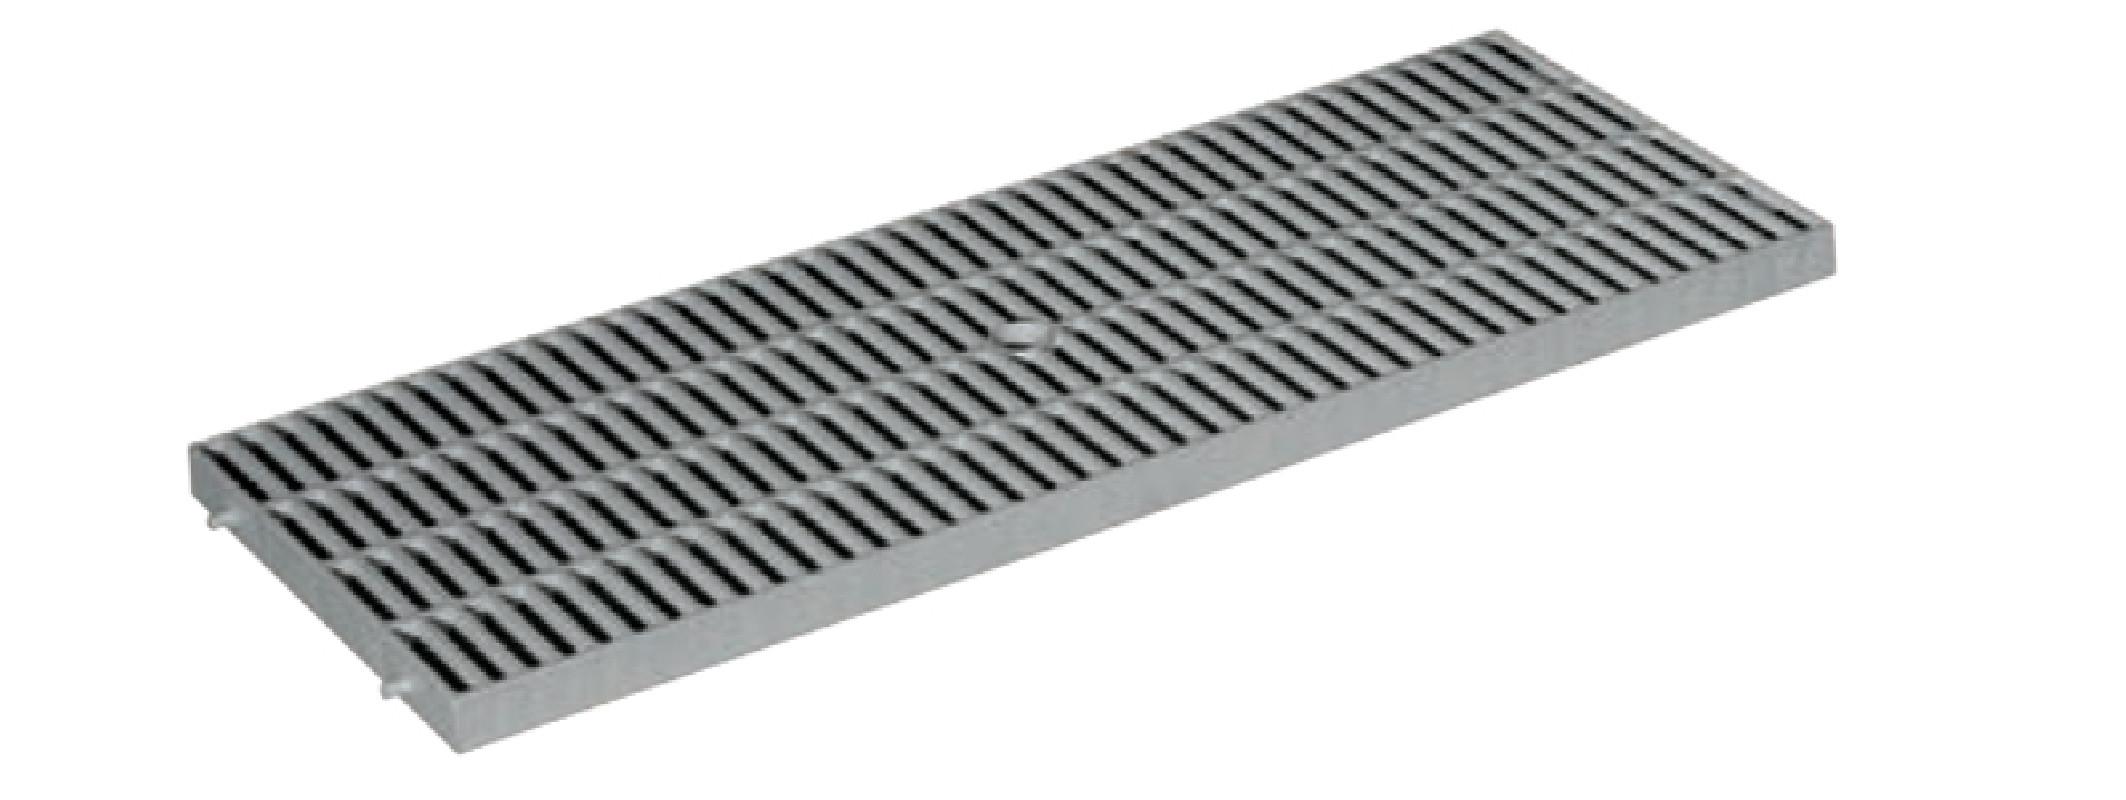 caniveau grille polypropyl ne gris brico toiture. Black Bedroom Furniture Sets. Home Design Ideas